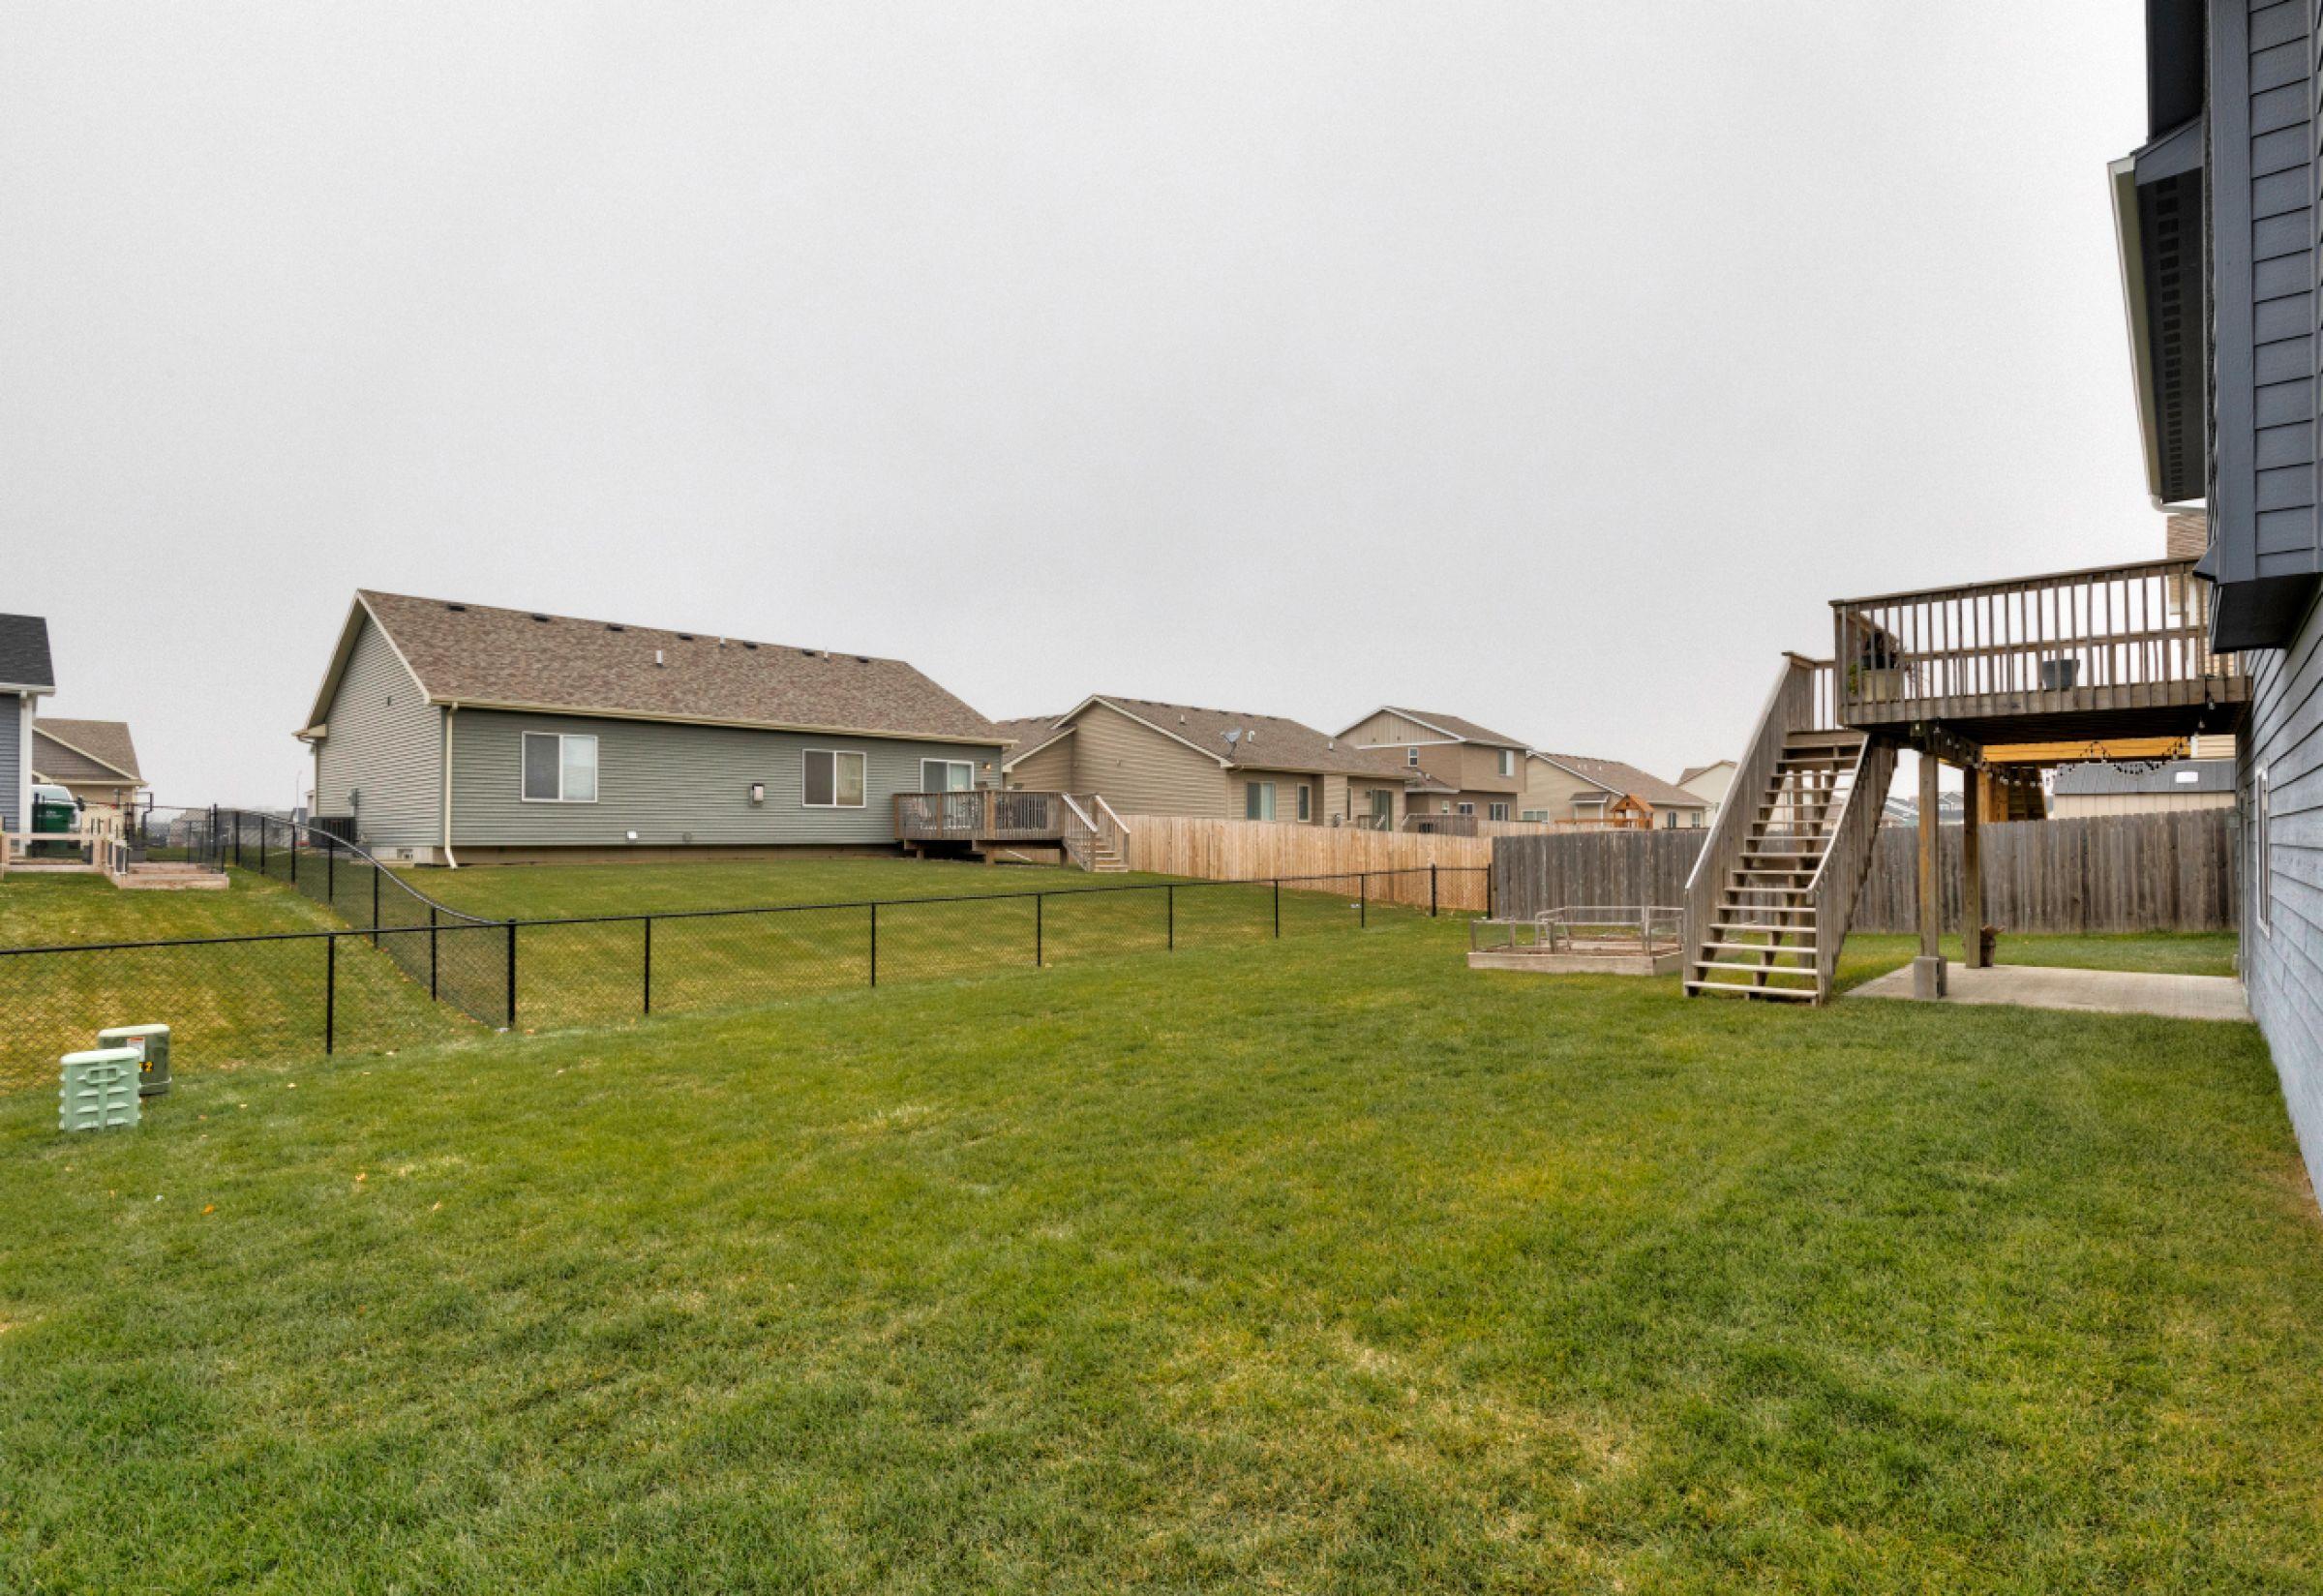 residential-polk-county-iowa-0-acres-listing-number-15273-3-2020-12-08-002840.jpg